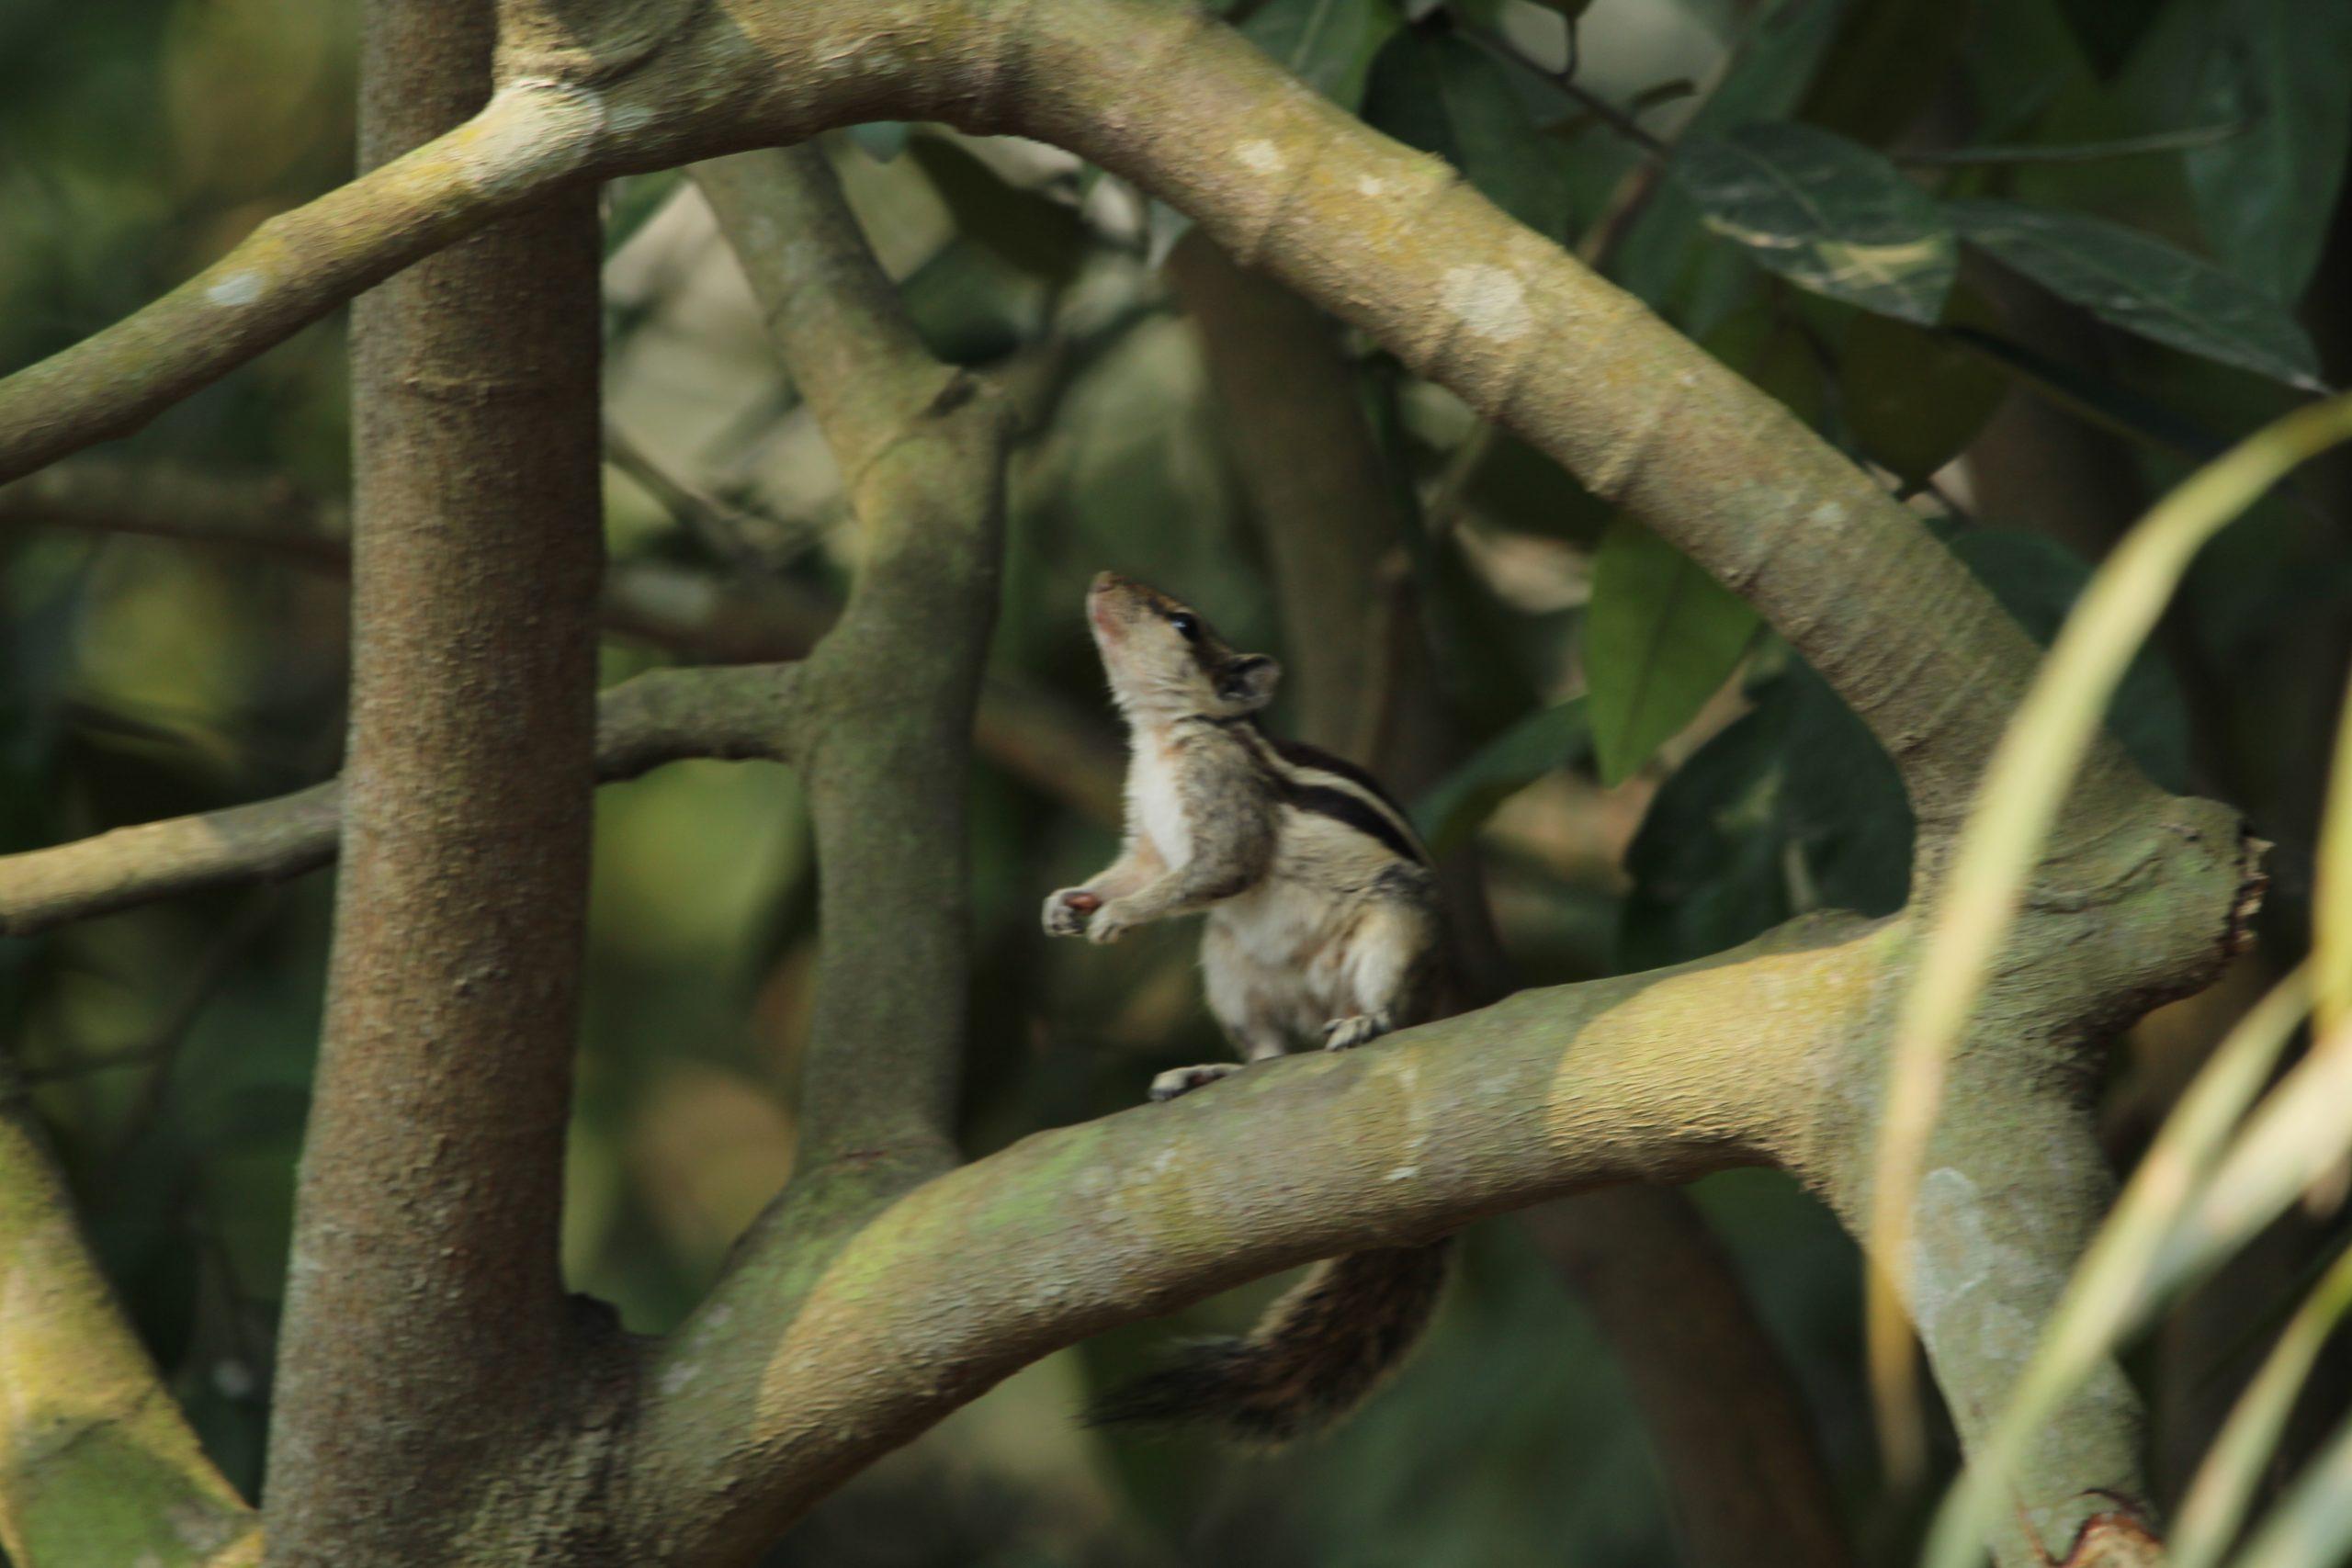 Squirrel on Branch